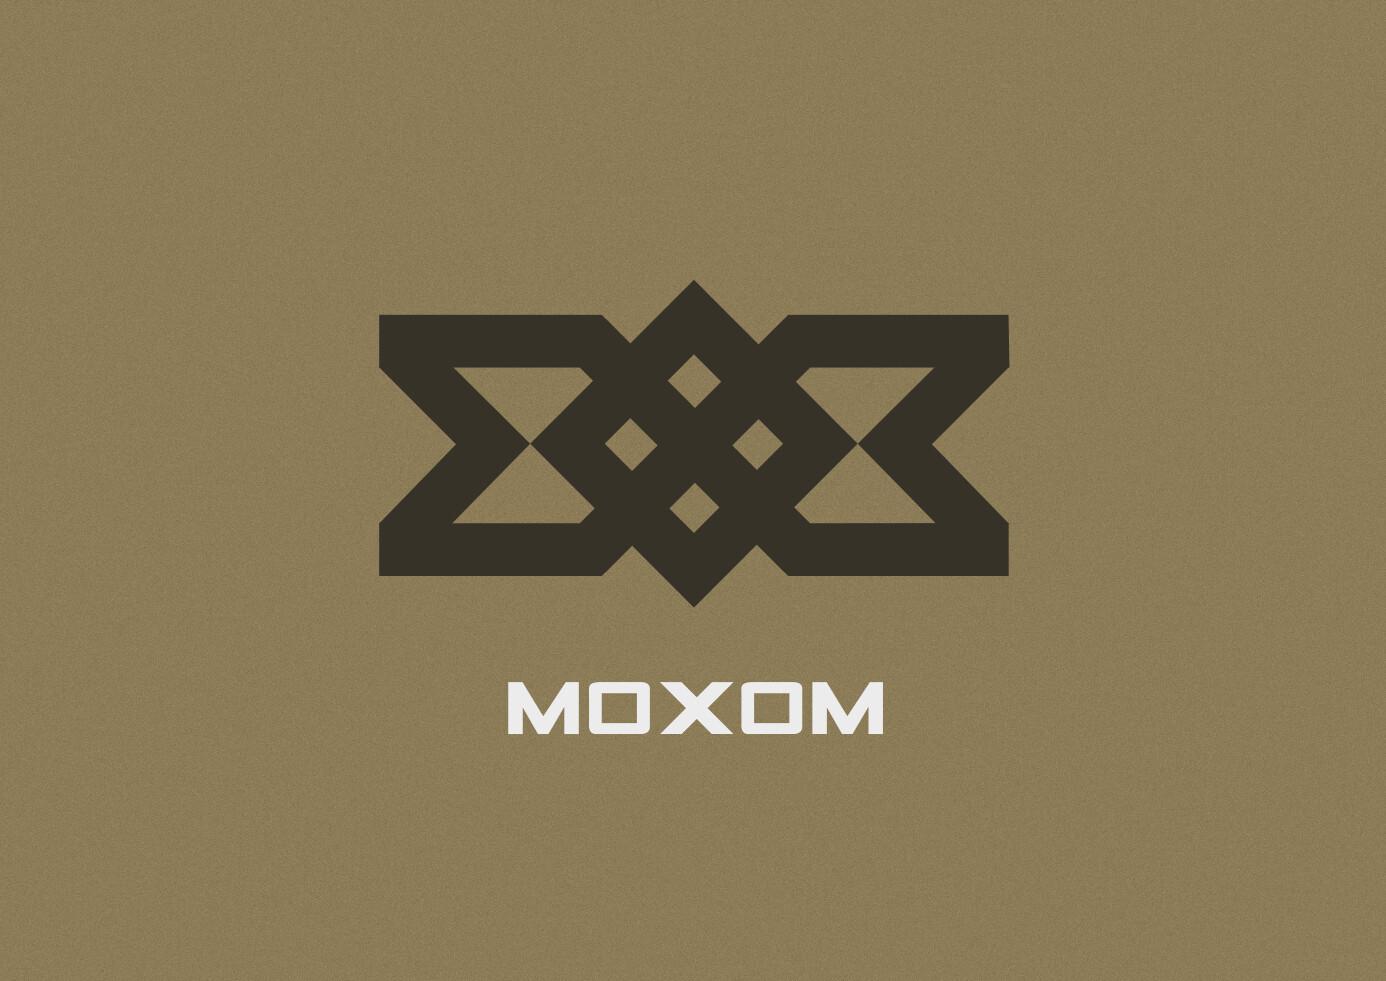 MOXOM - Reinforced Racing